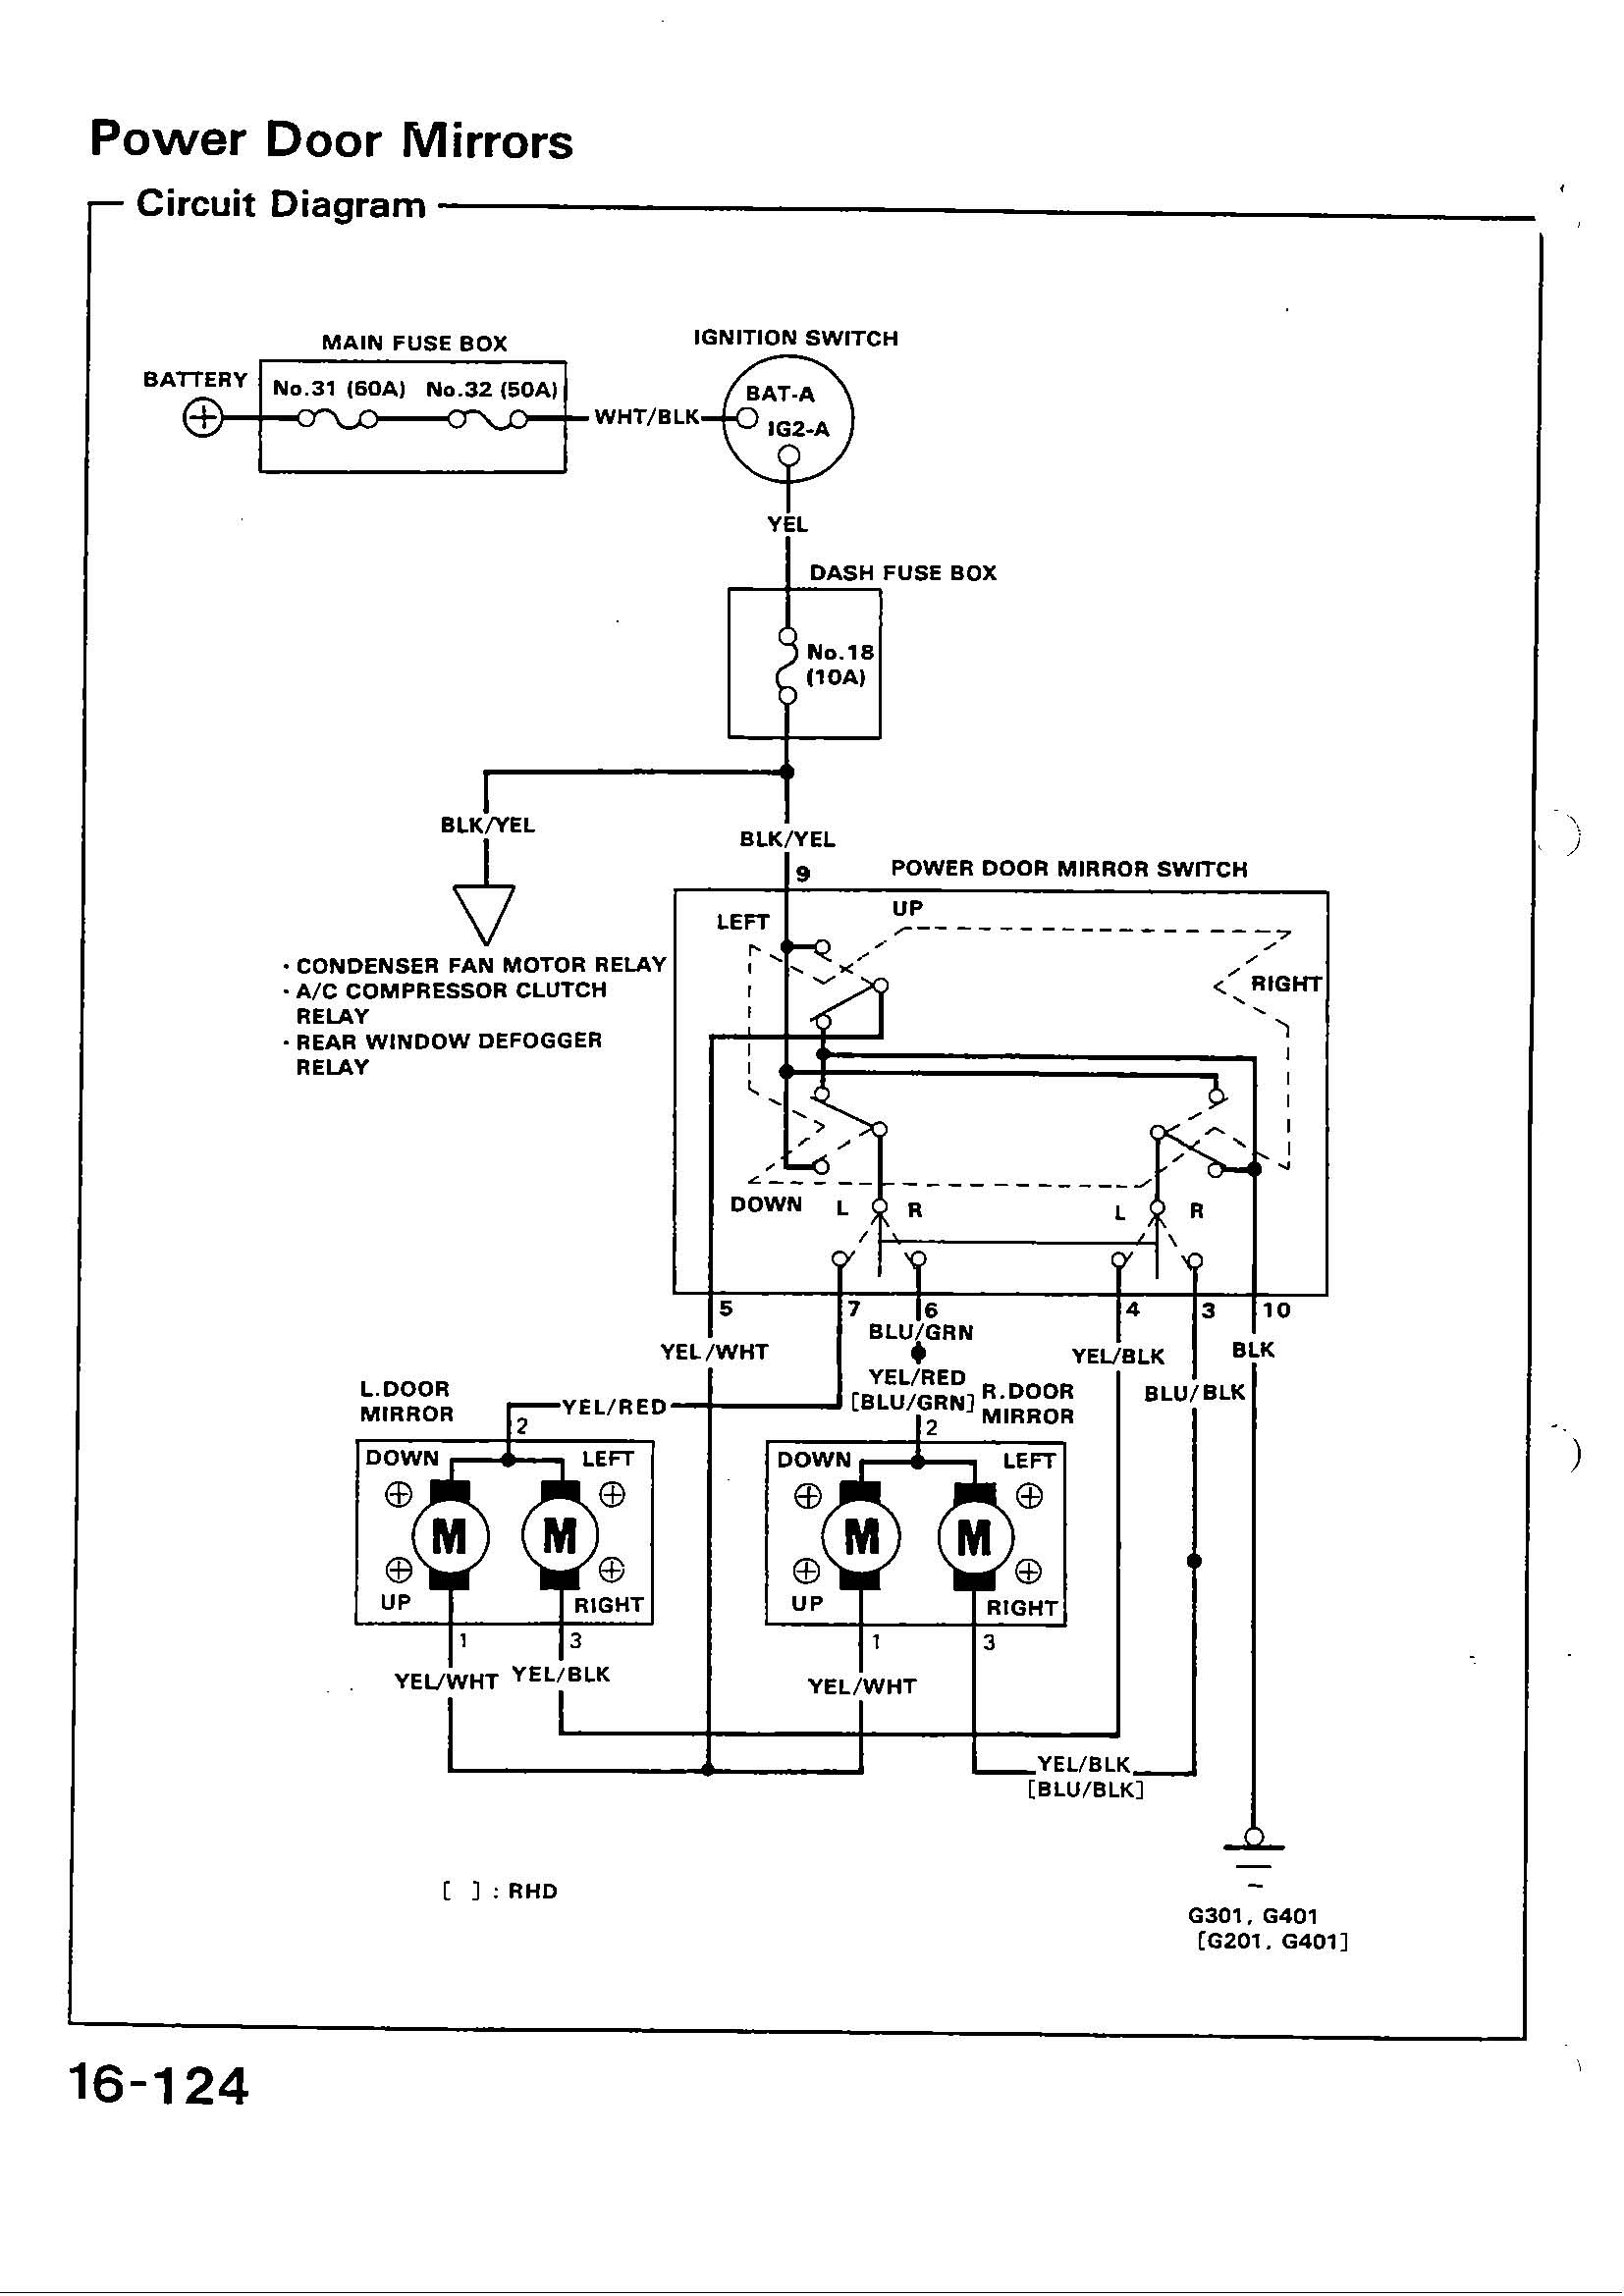 91CIVICPOWERMIRRORS?resize=665%2C940 diagrams 10001121 crx wiring diagram repair guides wiring crx main relay wiring diagram at eliteediting.co